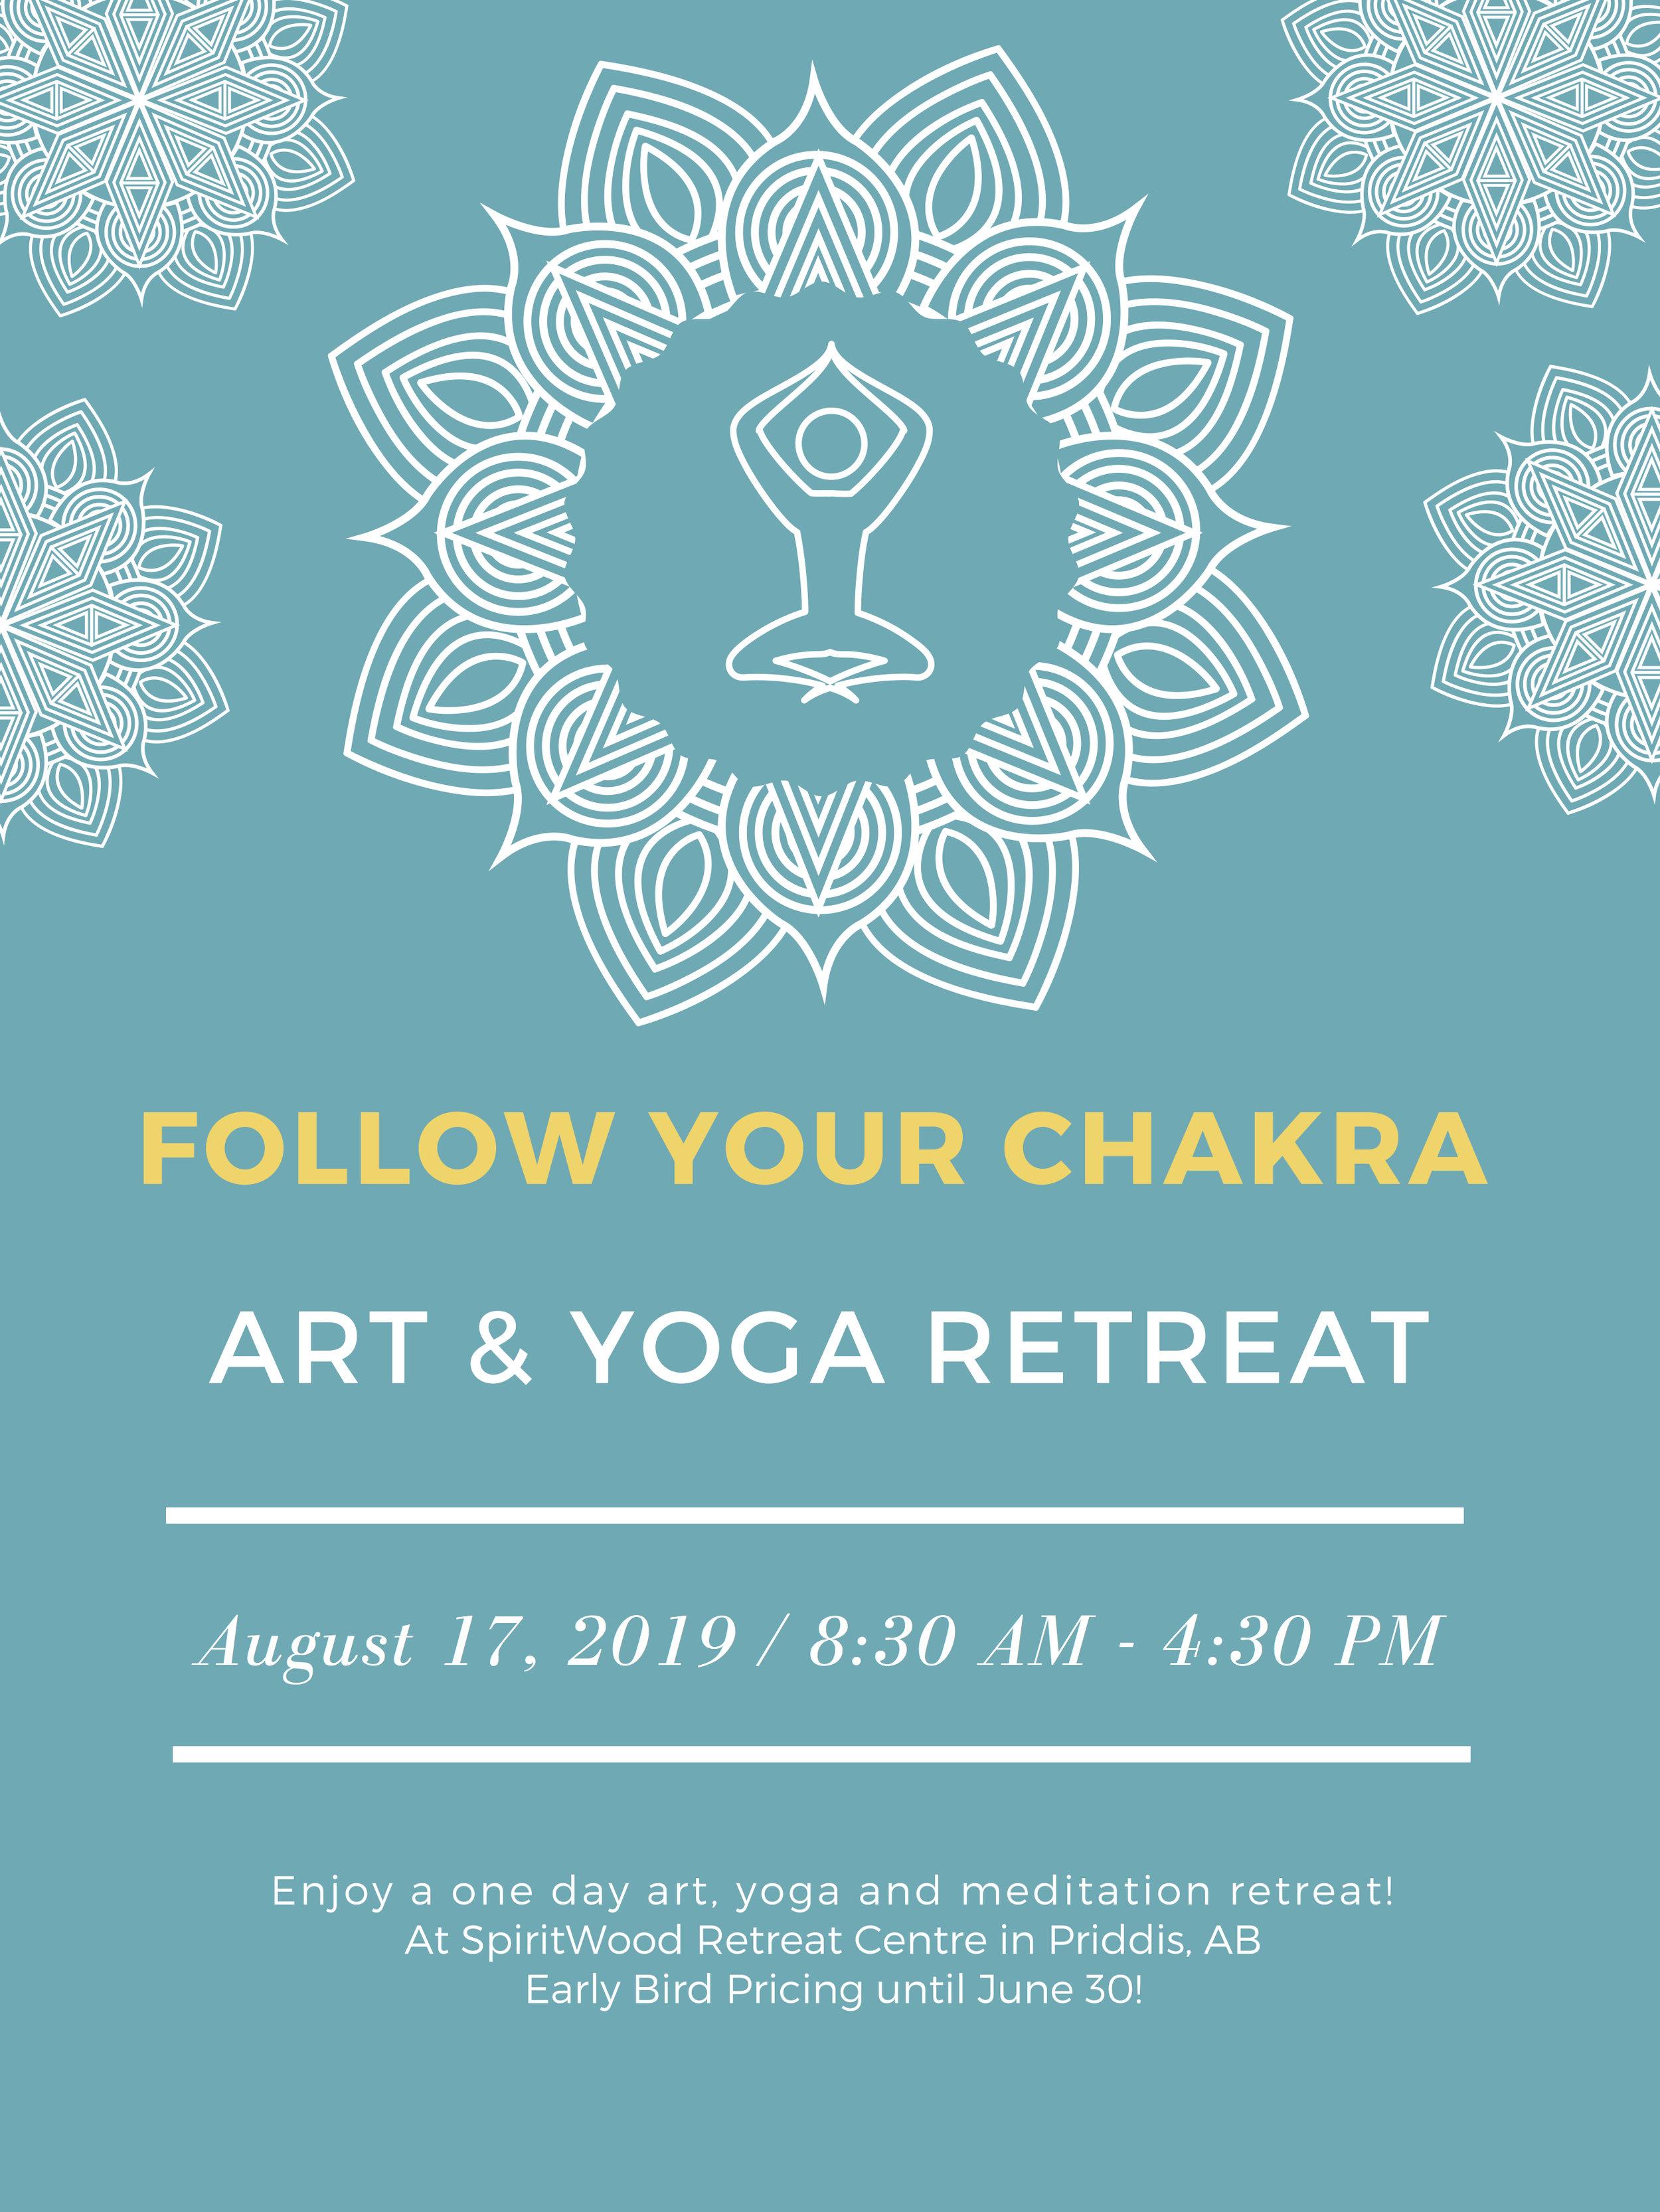 Follow Your Chakra Retreat poster 2 jpg.jpg